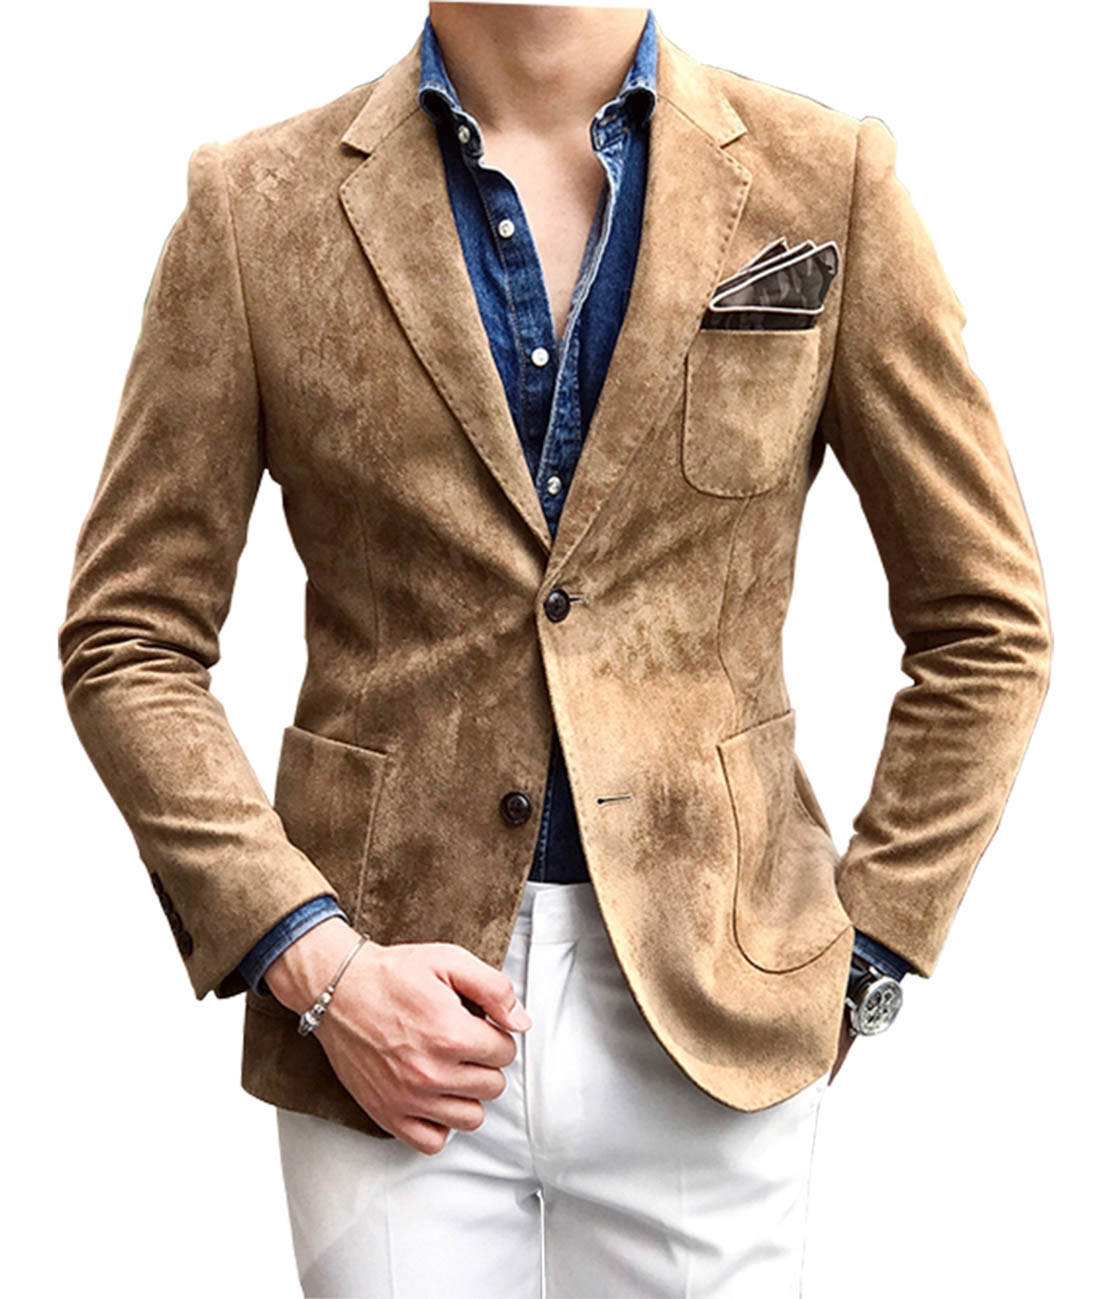 Solovedress Mens Suit White Pants Suede Blazer Notch Lapel Suede Wear Coat Formal Jacket Single Breasted Wedding Groomsmen M06